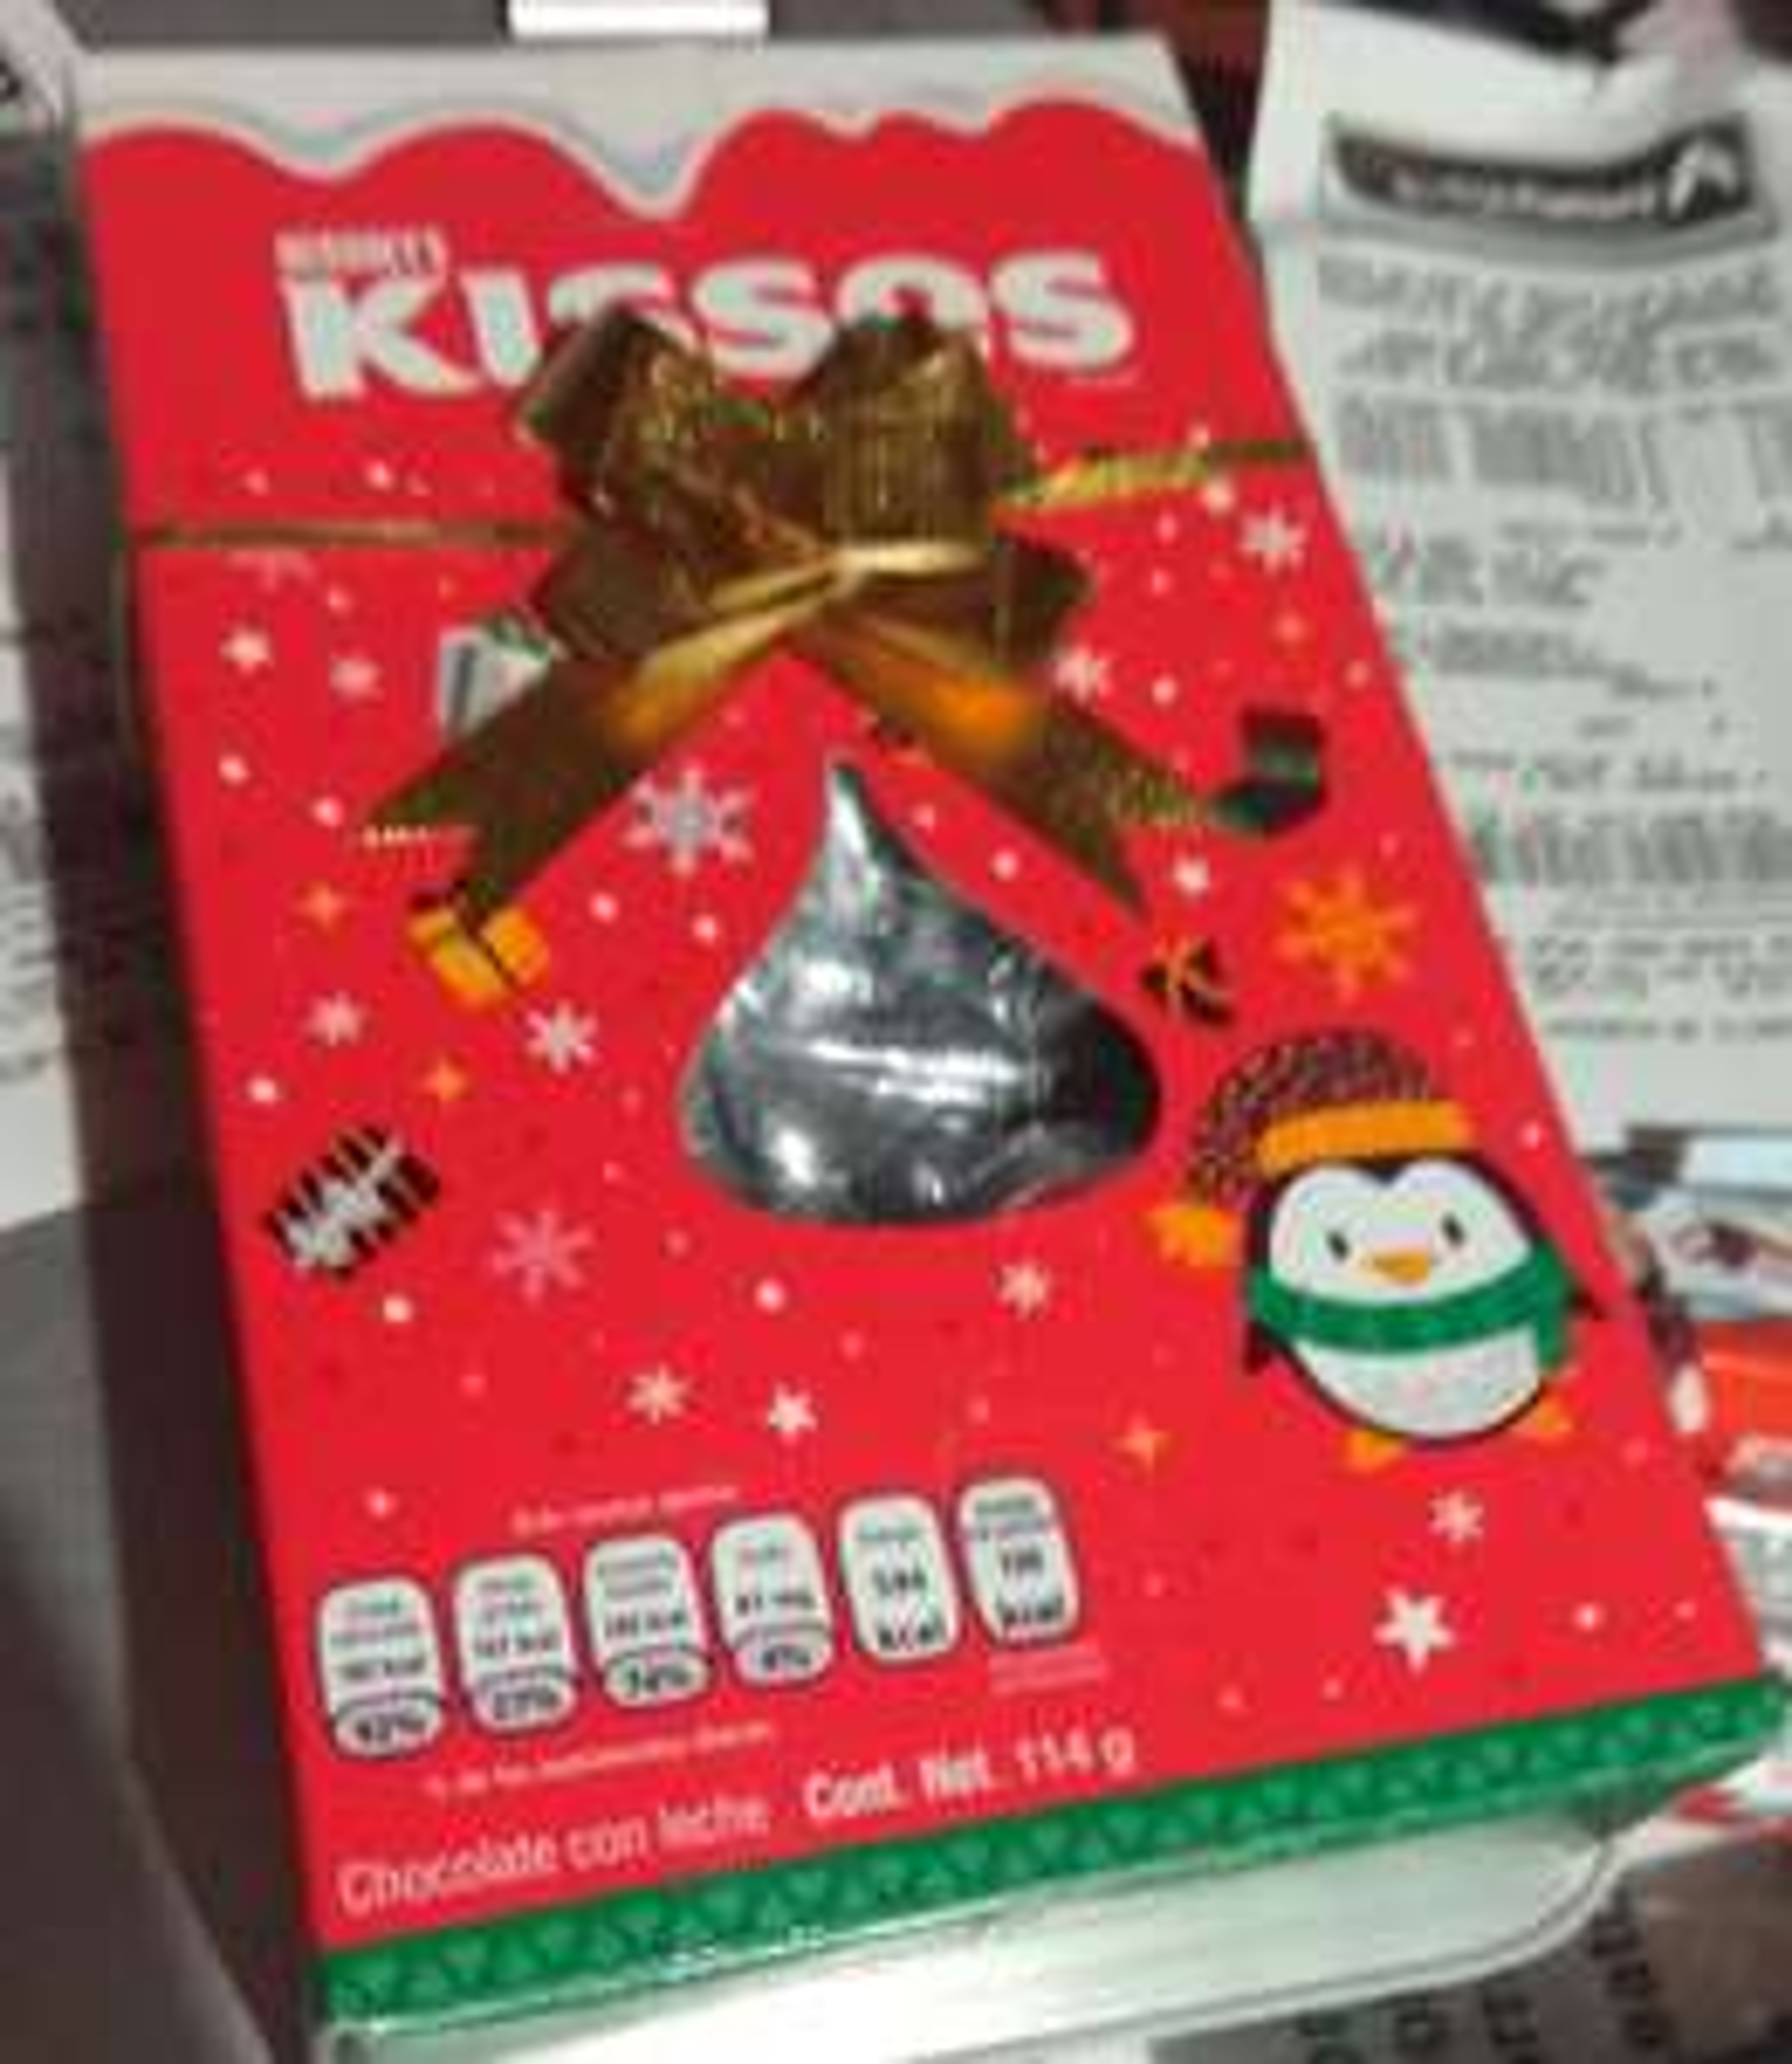 Bodega Aurrera Naranjos Oaxaca: Chocolate Kisses Hersey's y Kinder